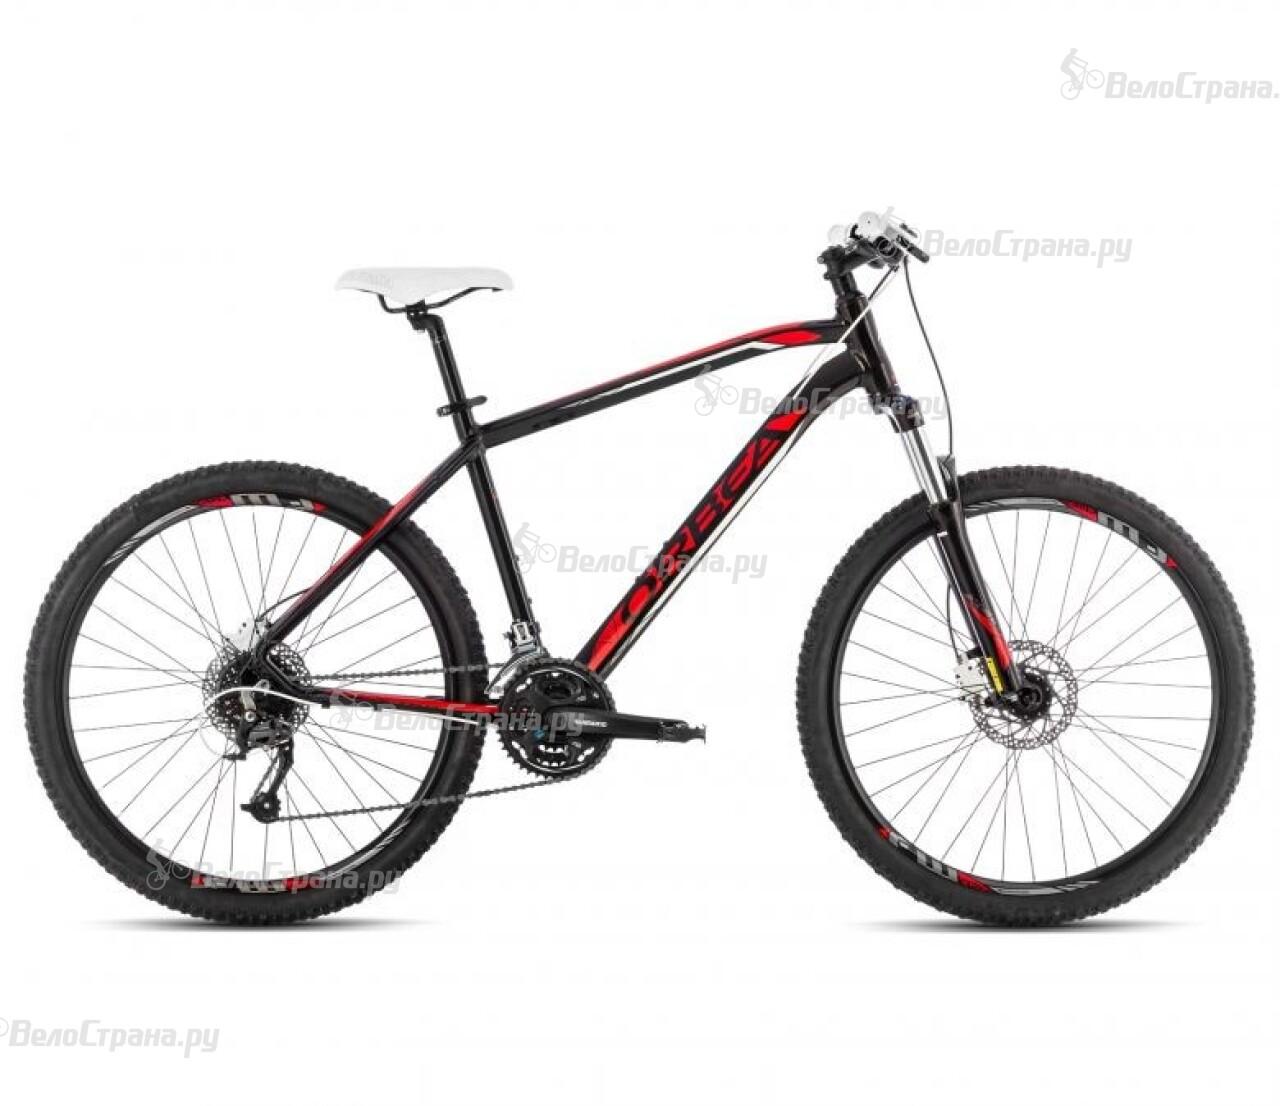 все цены на Велосипед Orbea Mx 26 30 Dama (2014) онлайн